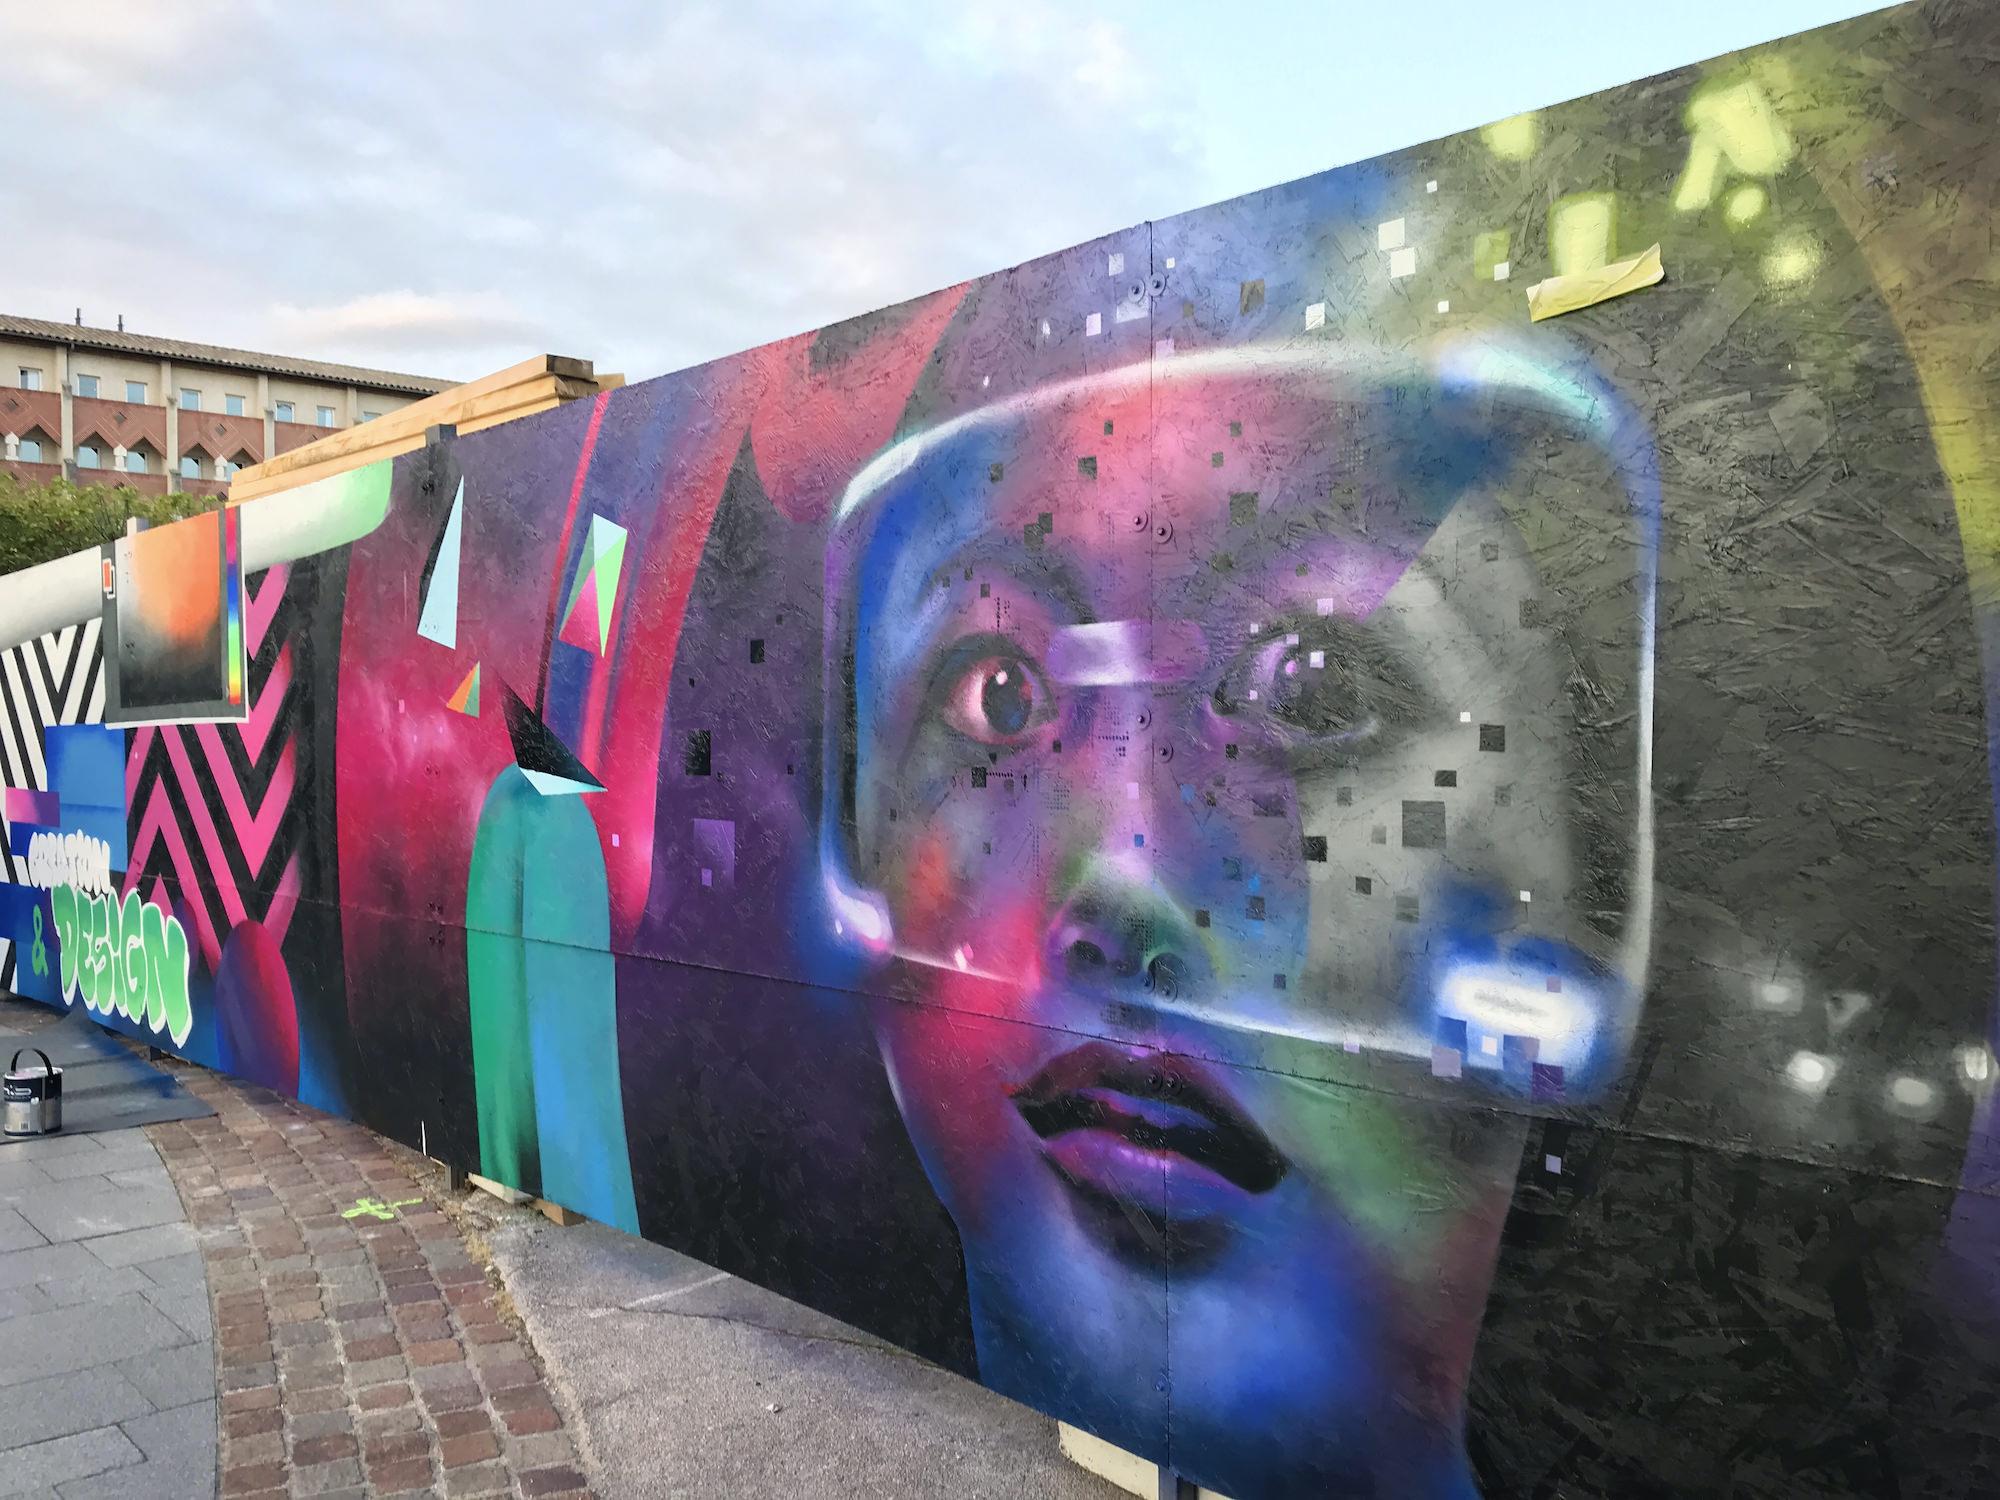 fresque ynov icade realisme portrait graffeur graff streetart toulouse metropole